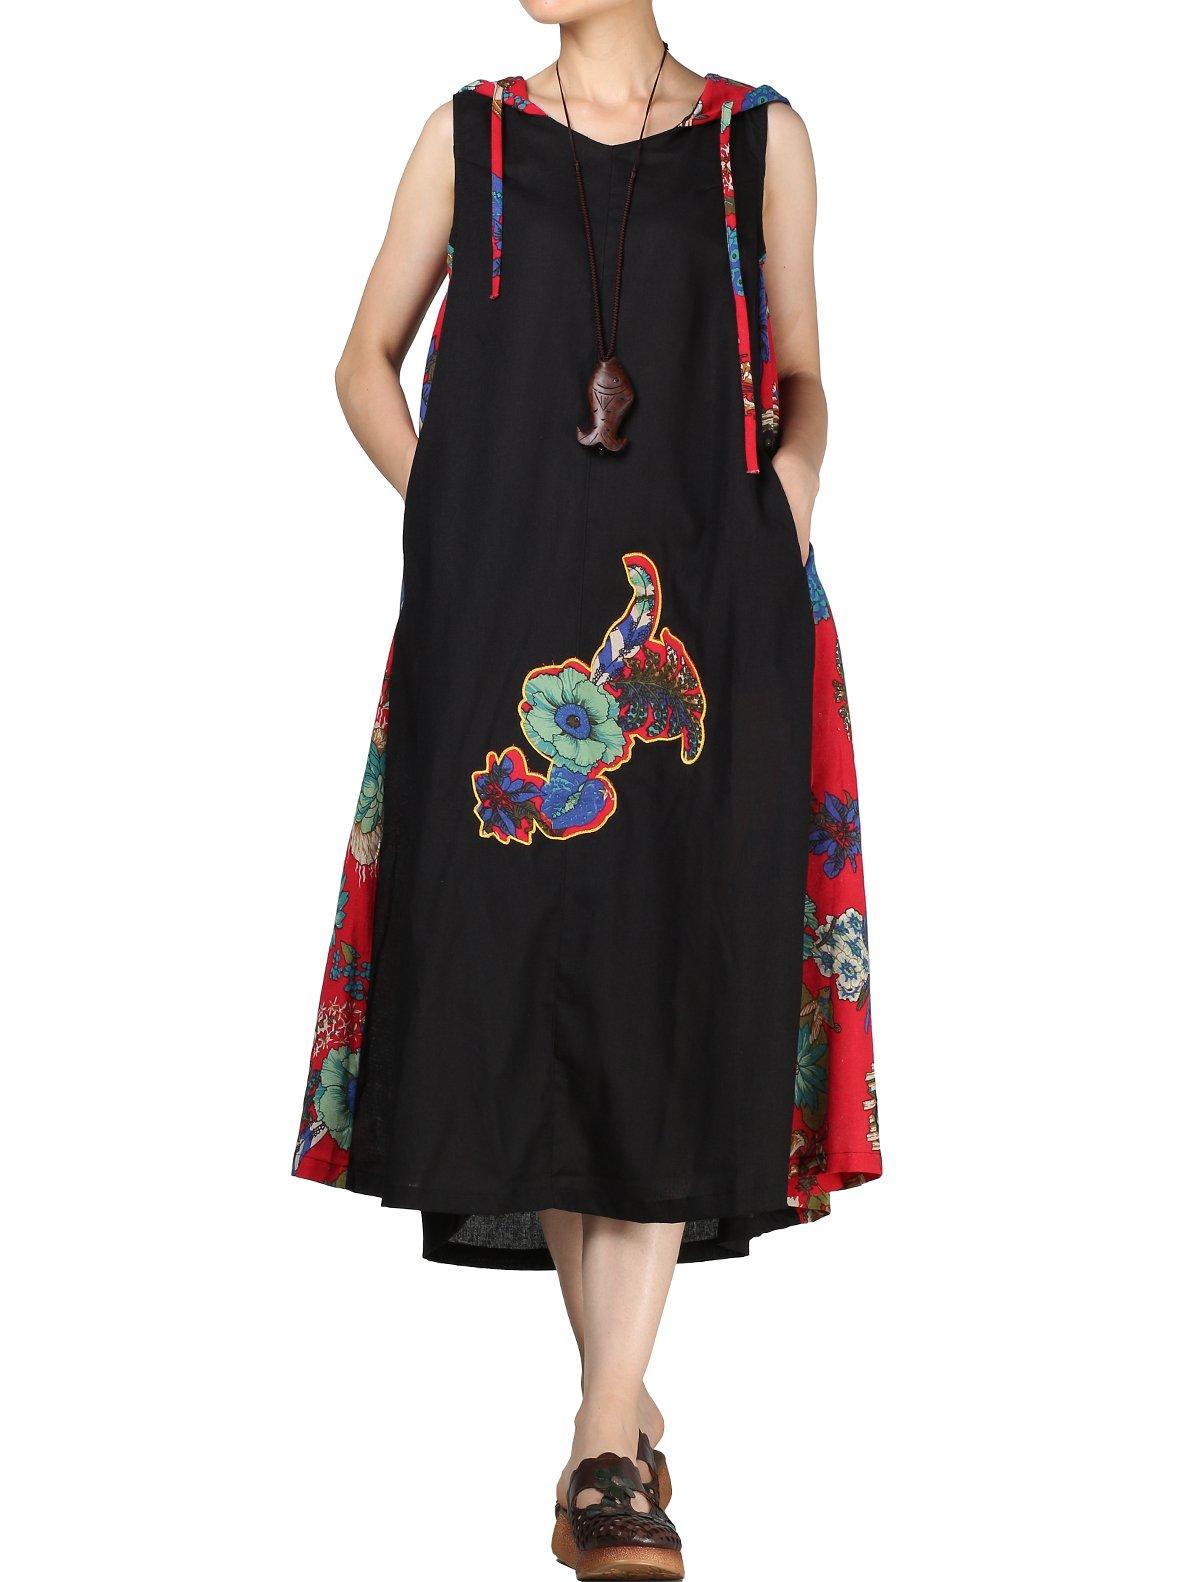 Mordenmiss Women's Summer Sleeveless Printing Hoodie Dress L Black